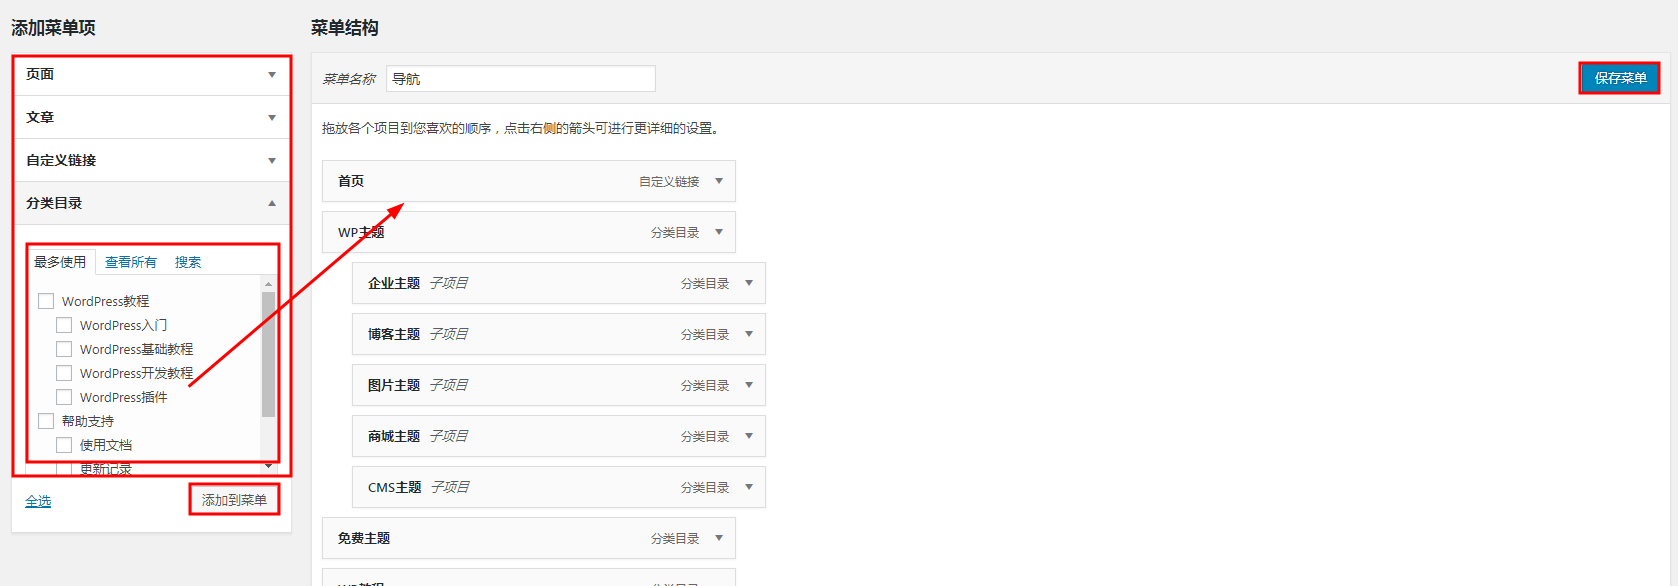 WordPress后台添加导航菜单入门教程 (https://www.yunsxr.com/) WordPress入门 第5张